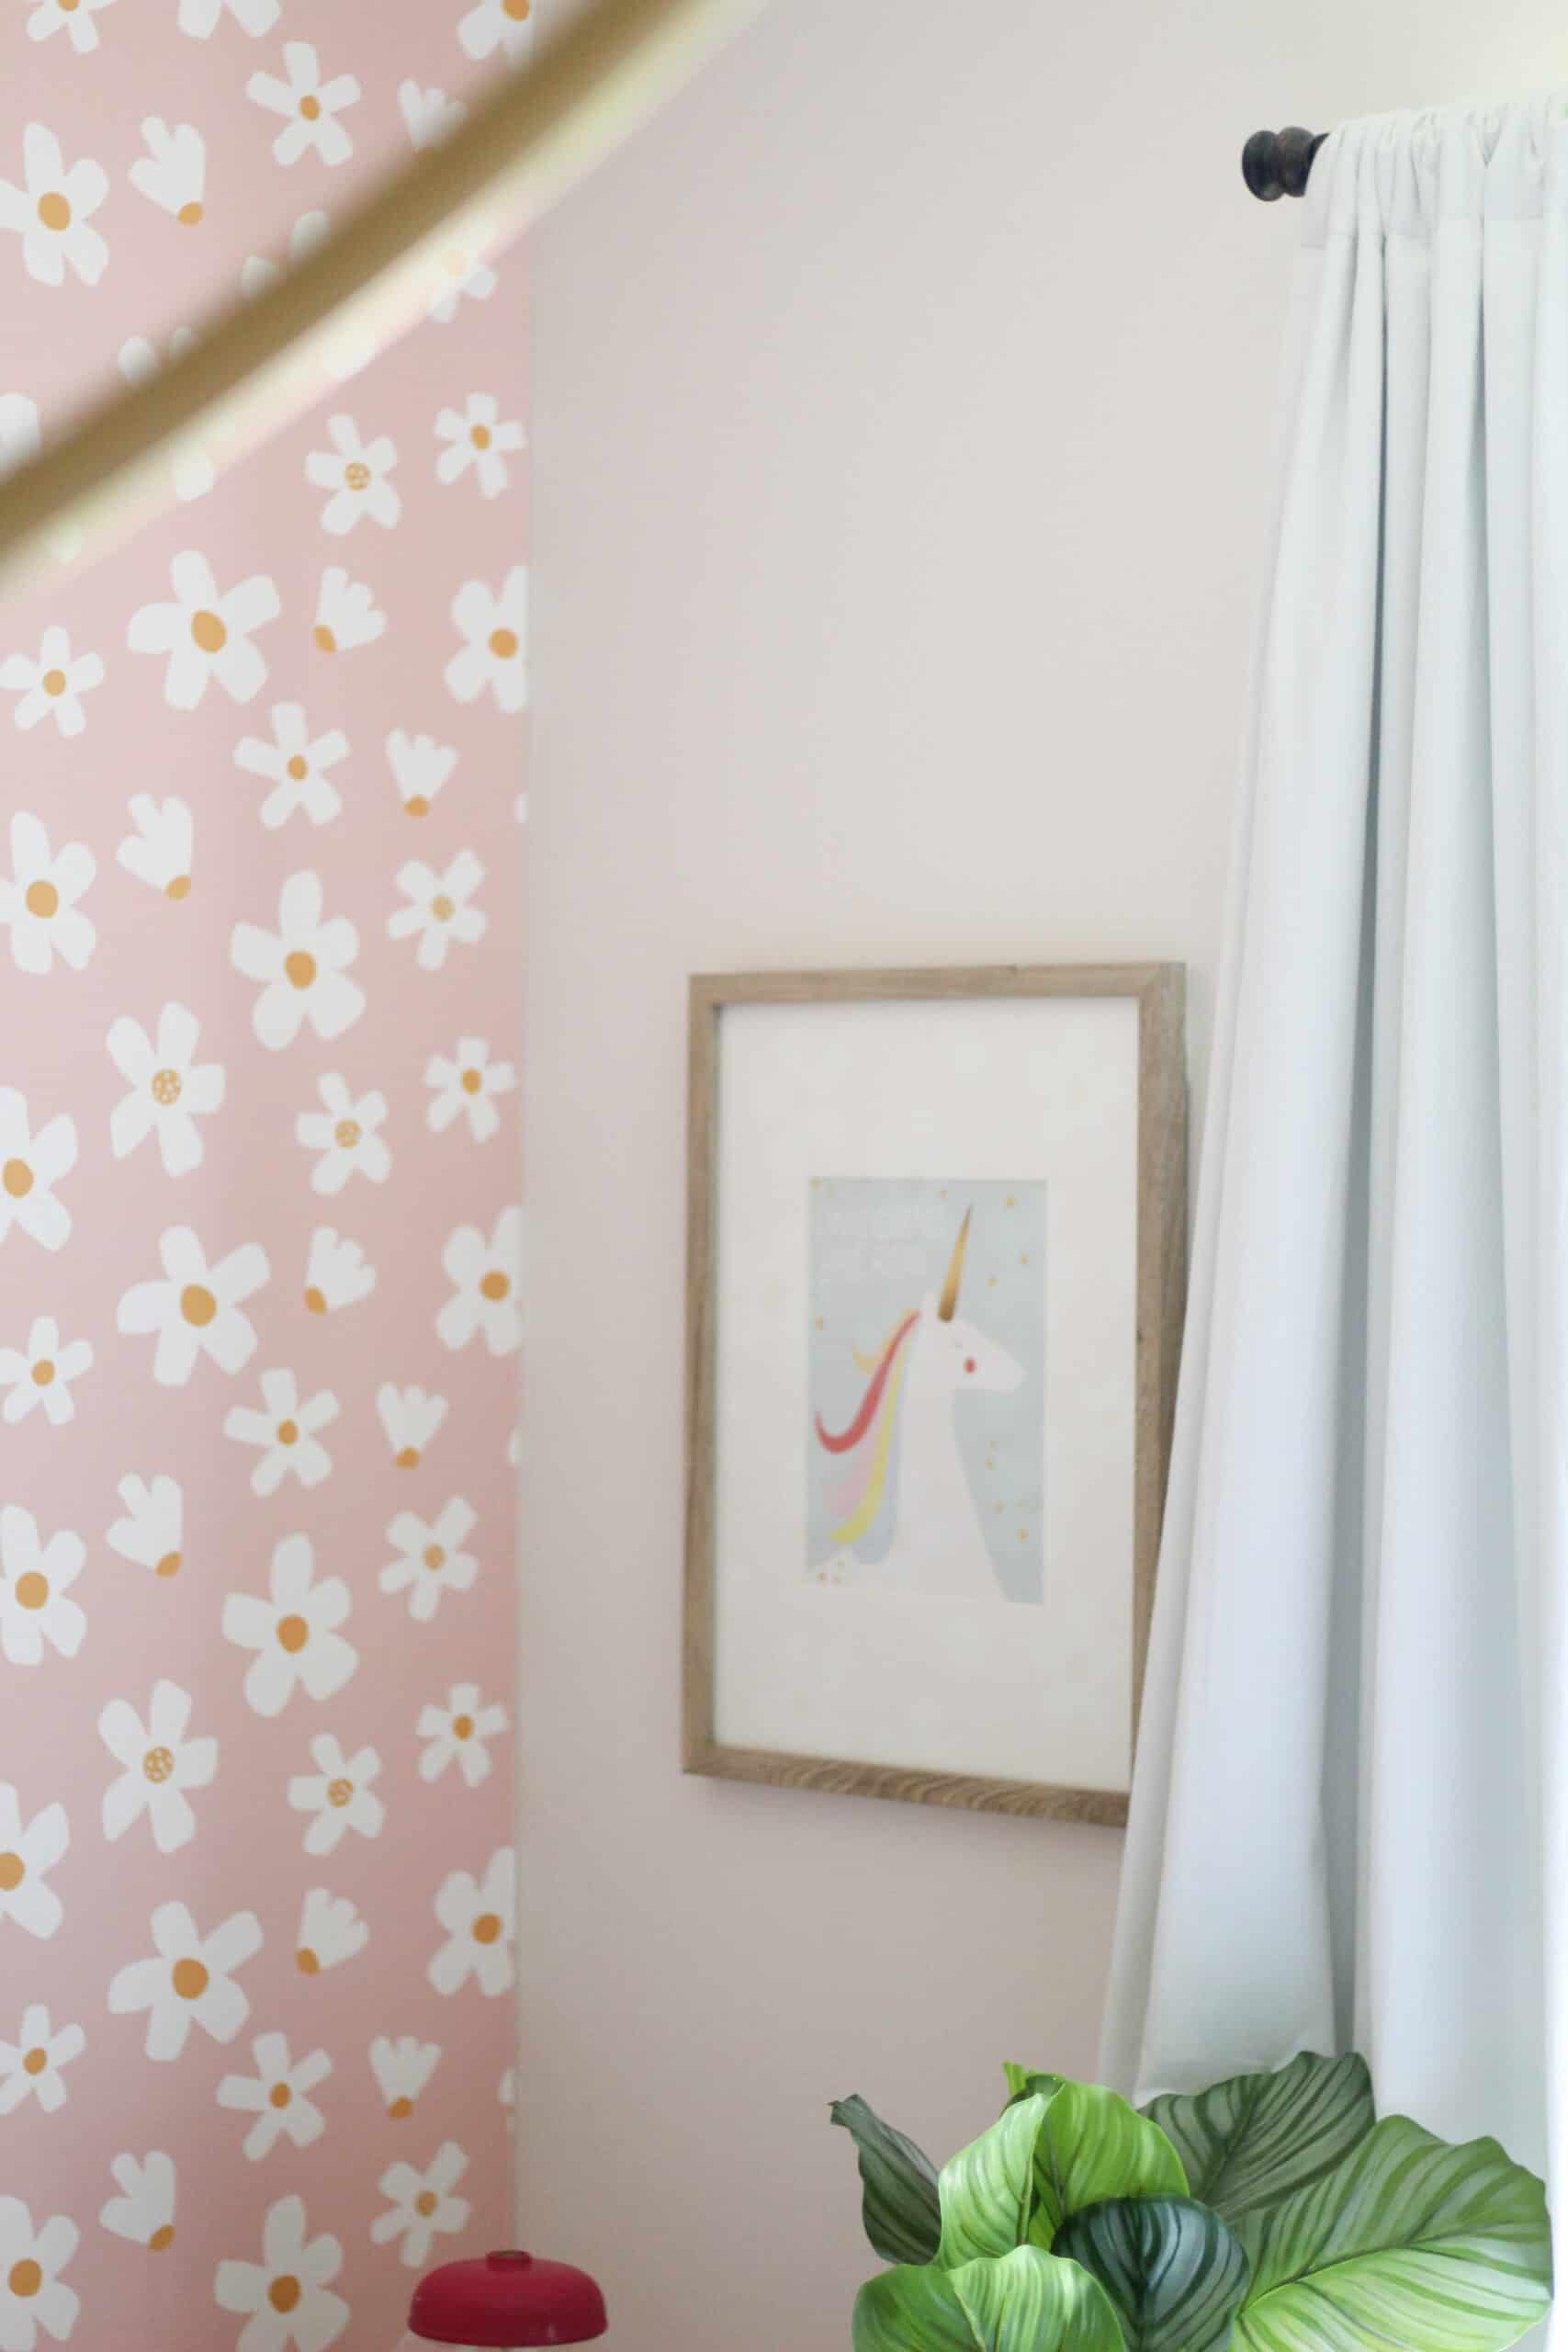 unicorn picture in kids room